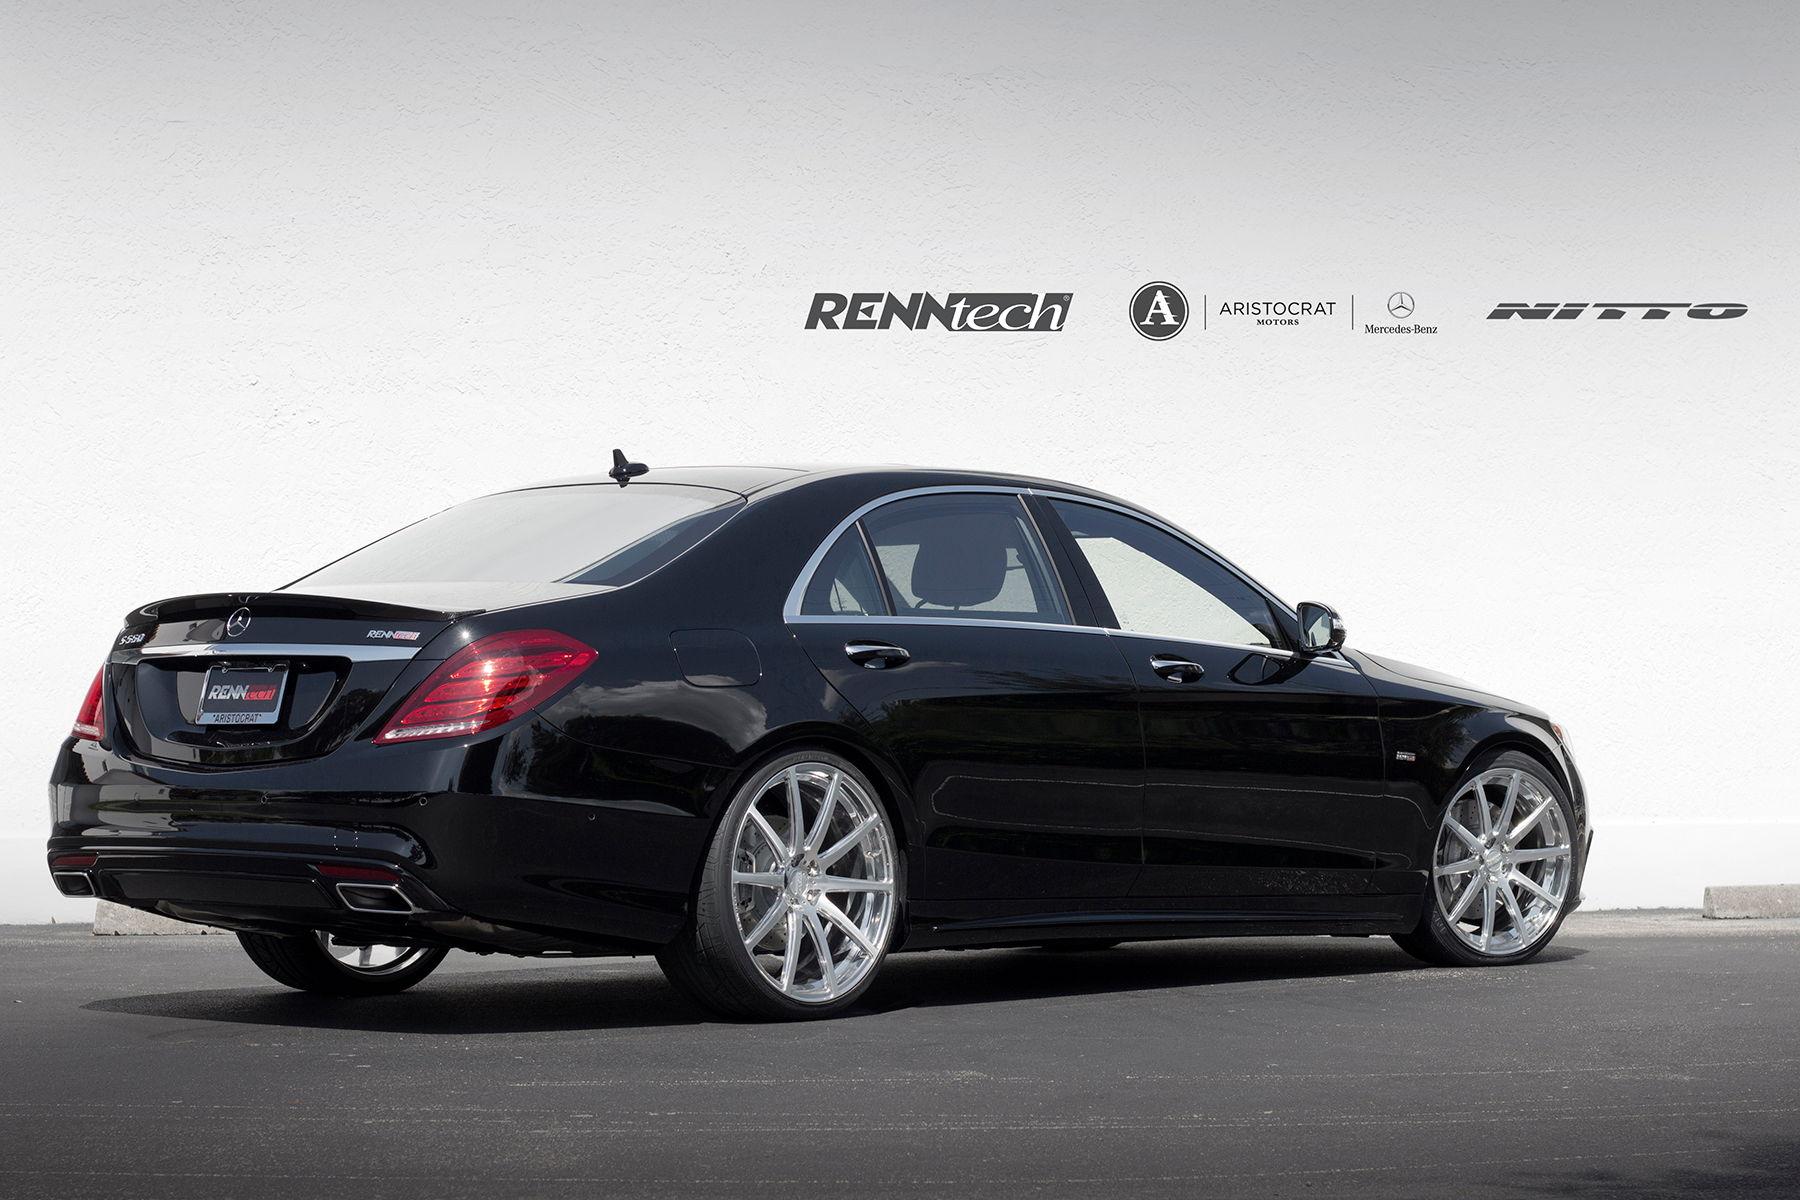 Mercedes benz s 550 renntech aristocrat mbworld for 550 amg mercedes benz